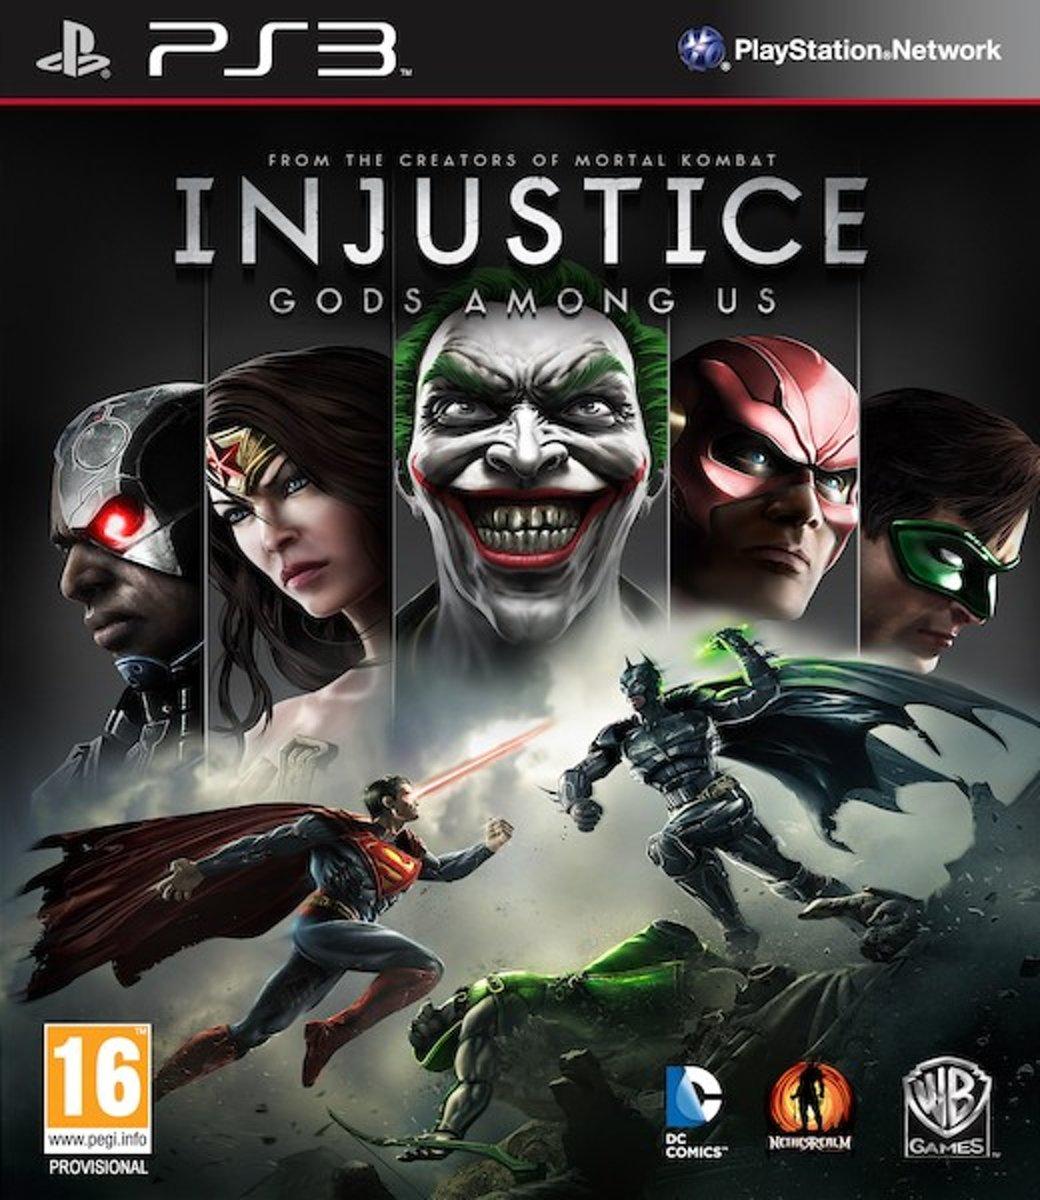 Injustice: Gods Among Us /PS3 kopen